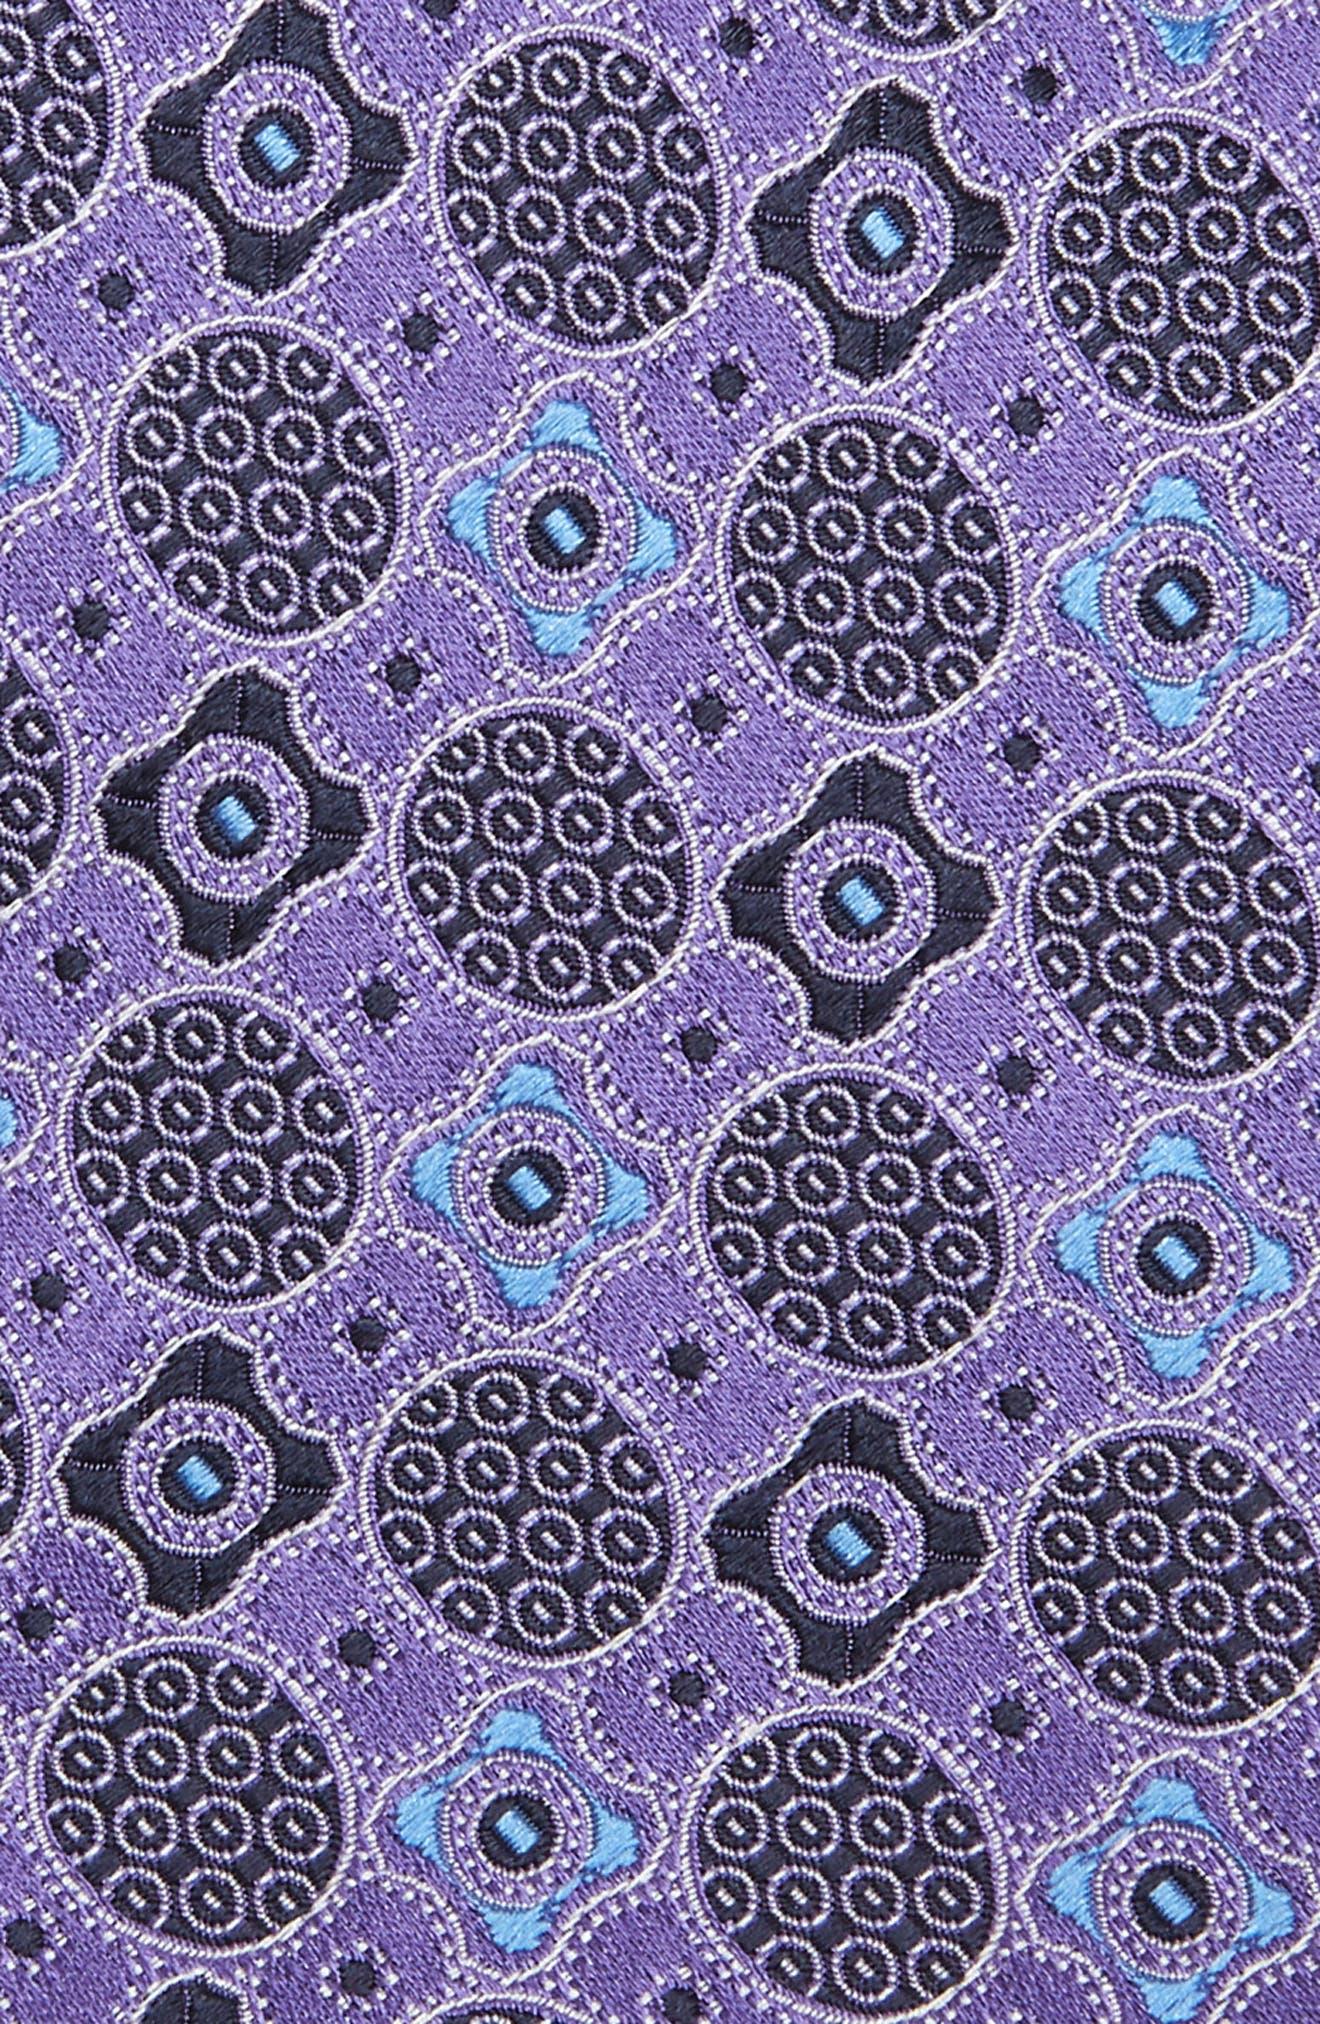 ERMENEGILDO ZEGNA, Microfloral Medallion Silk Tie, Alternate thumbnail 2, color, PURPLE